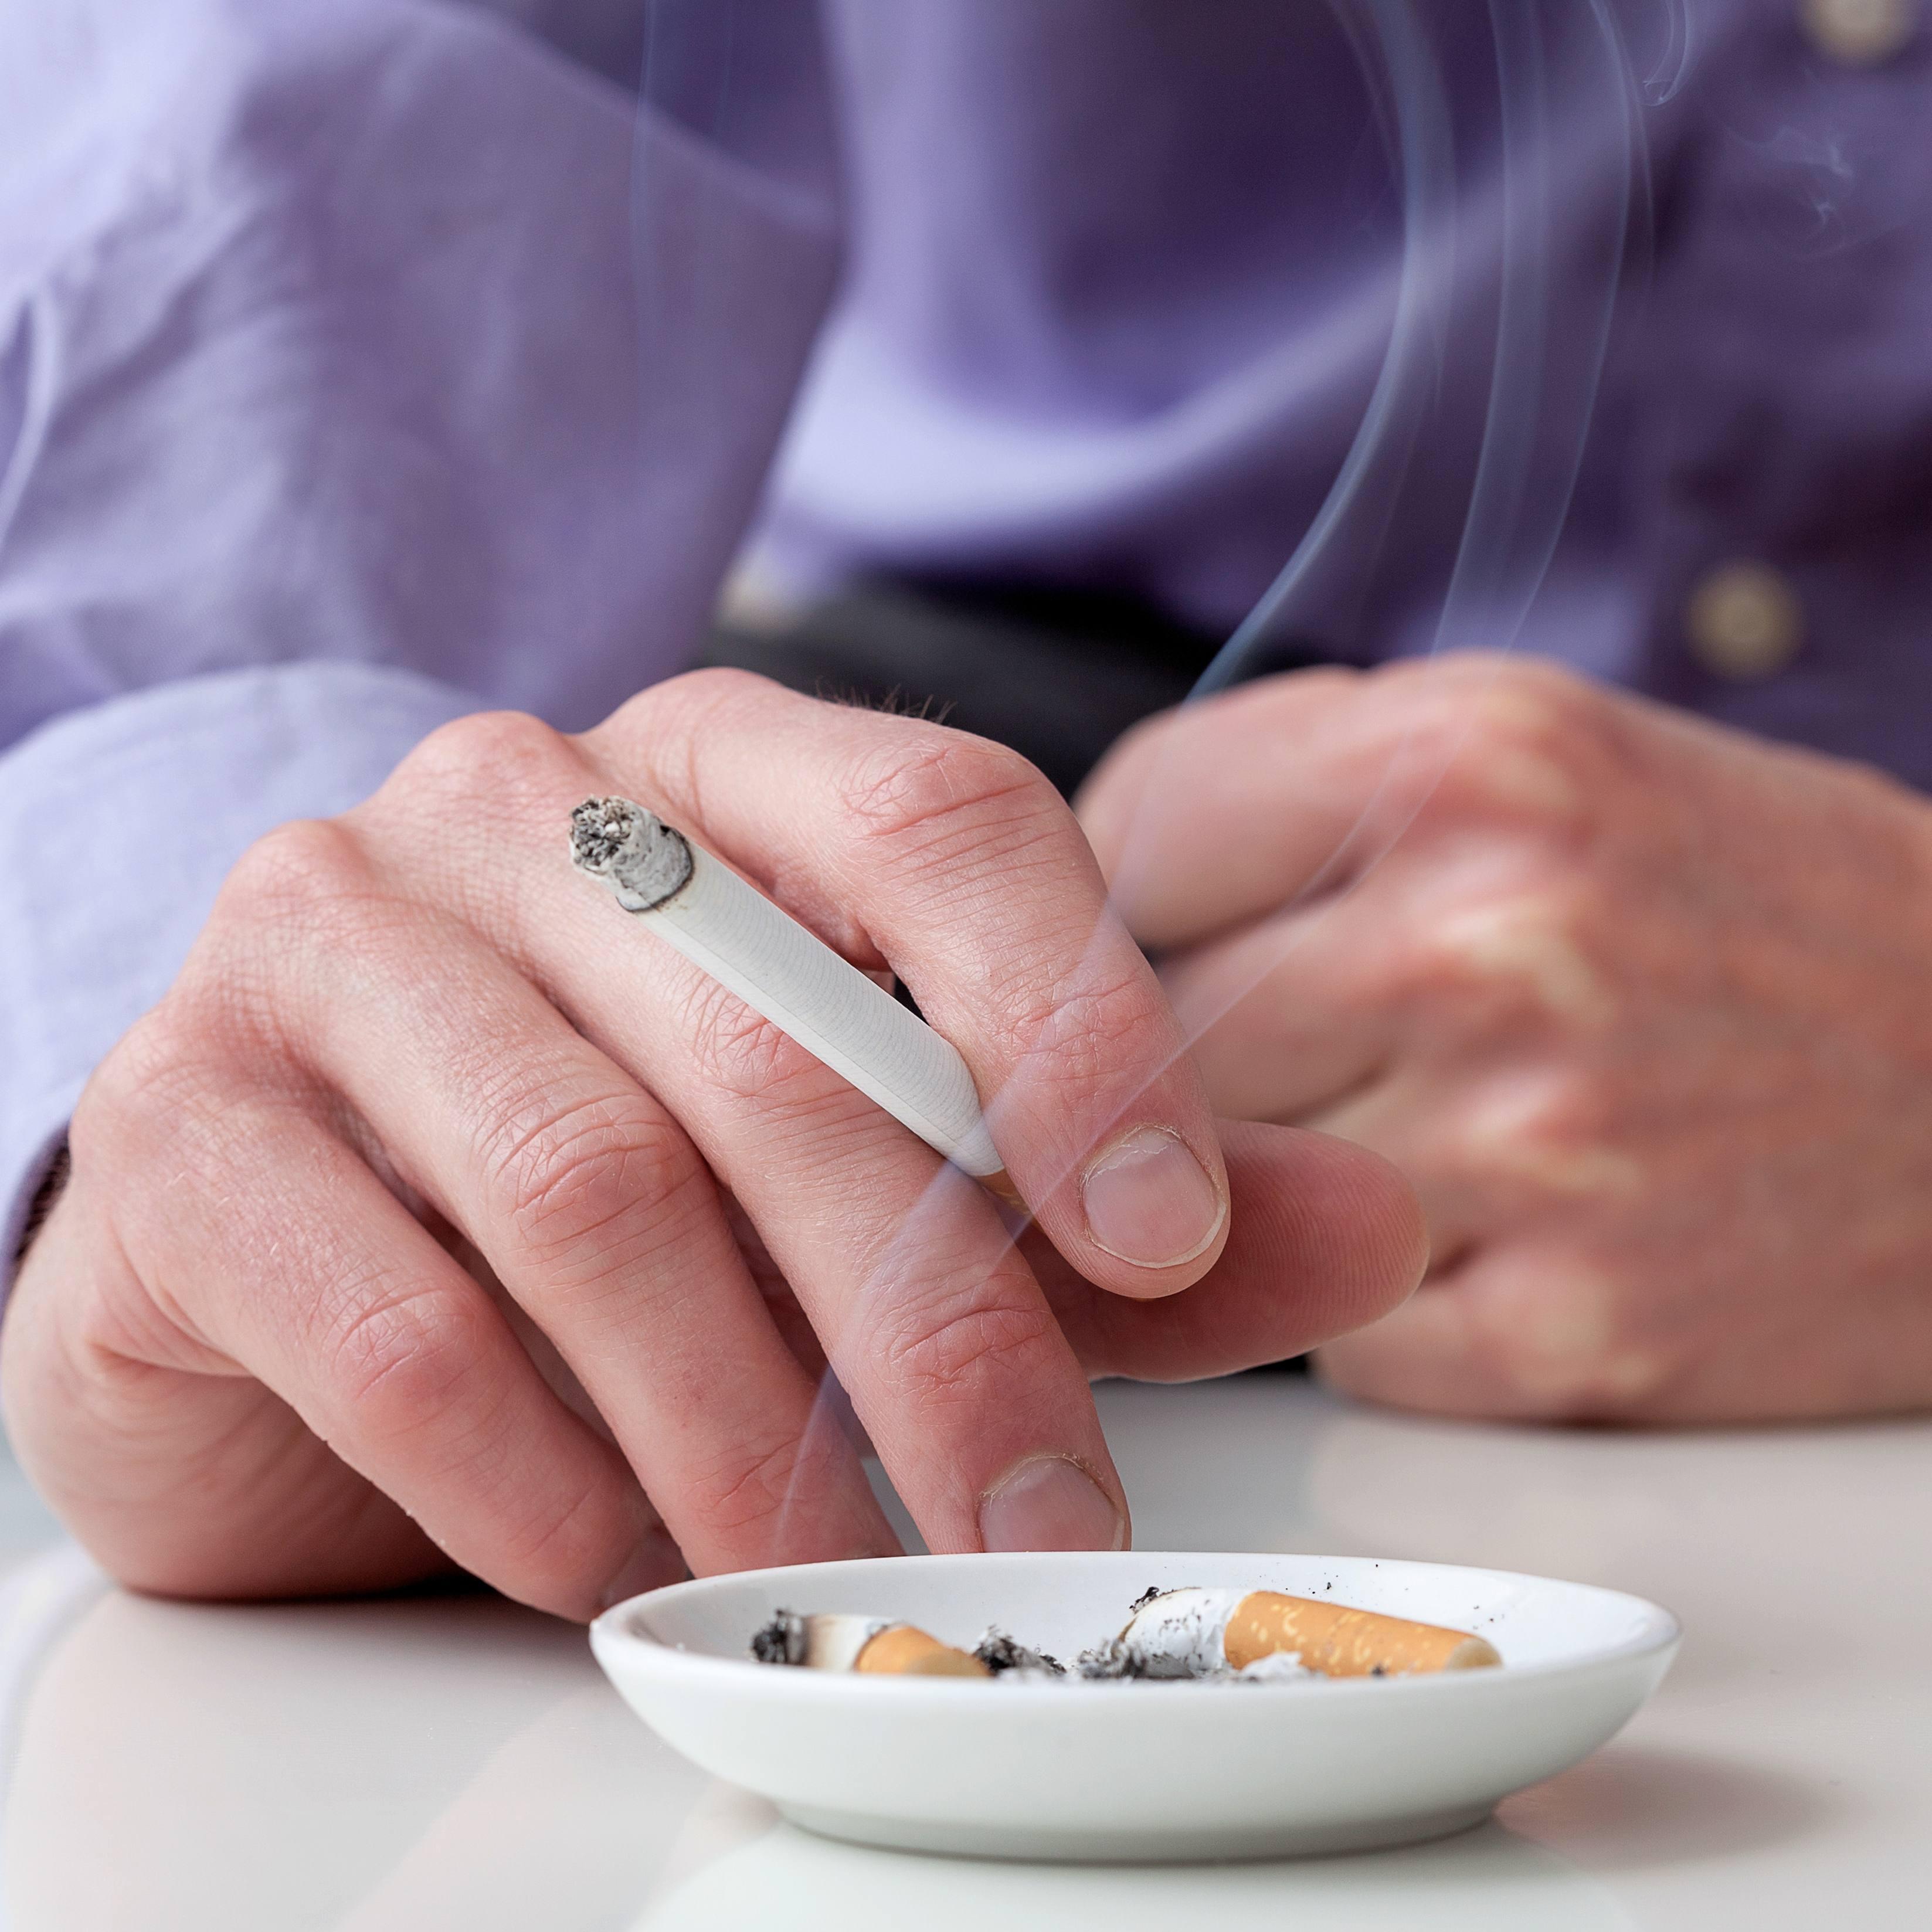 Man in blue shirt is smoking cigarette